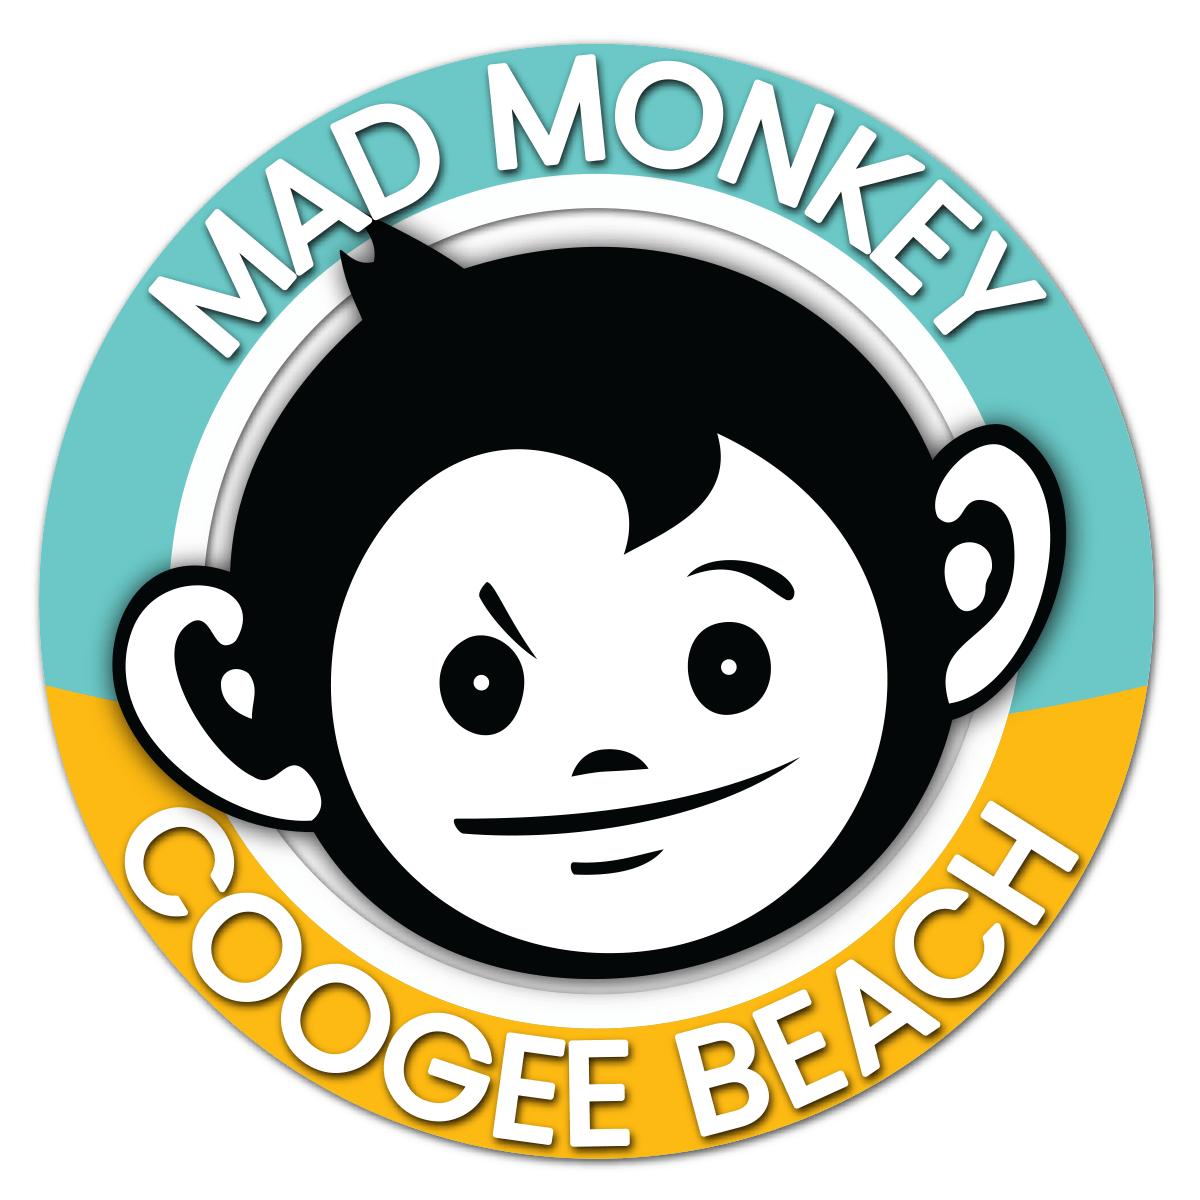 Mad Monkey Hostel Coogee Beach, Australia